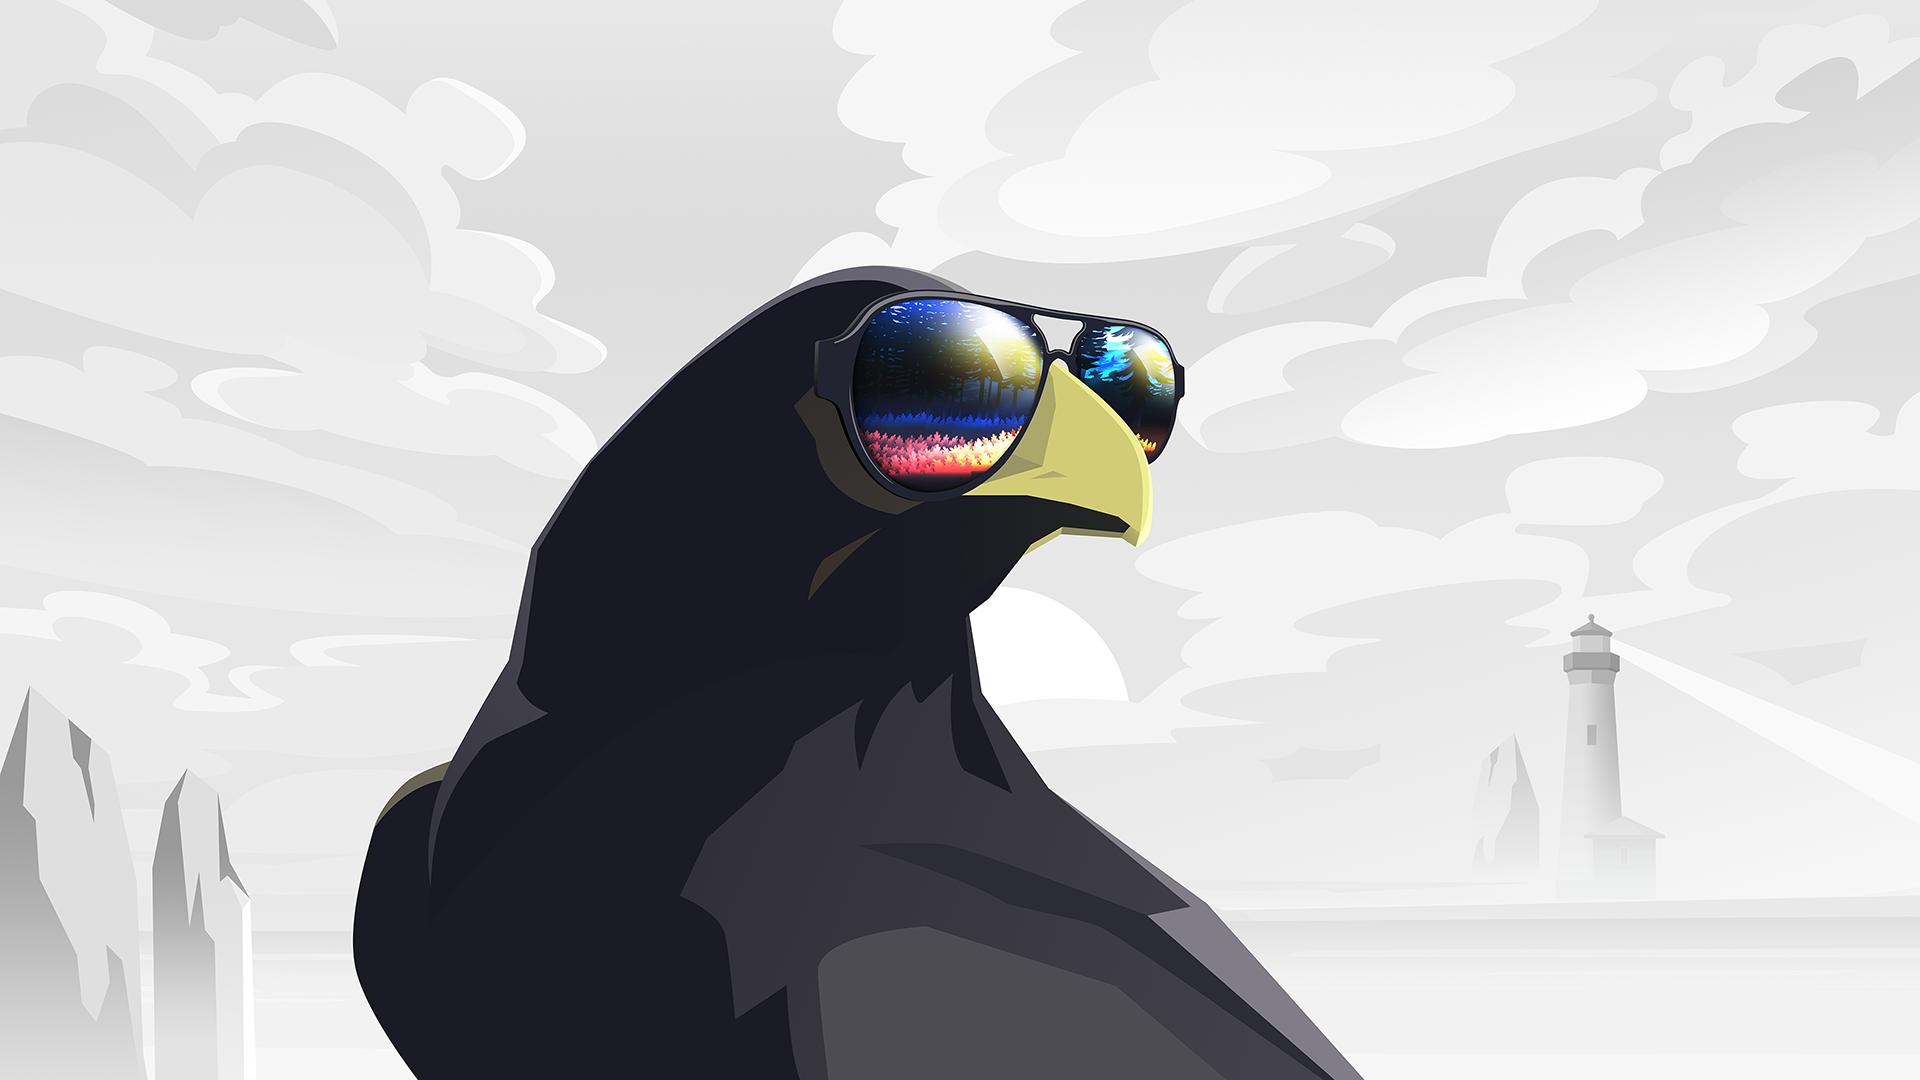 General 1920x1080 raven lighthouse glasses reflection Colors (Album) byrotek